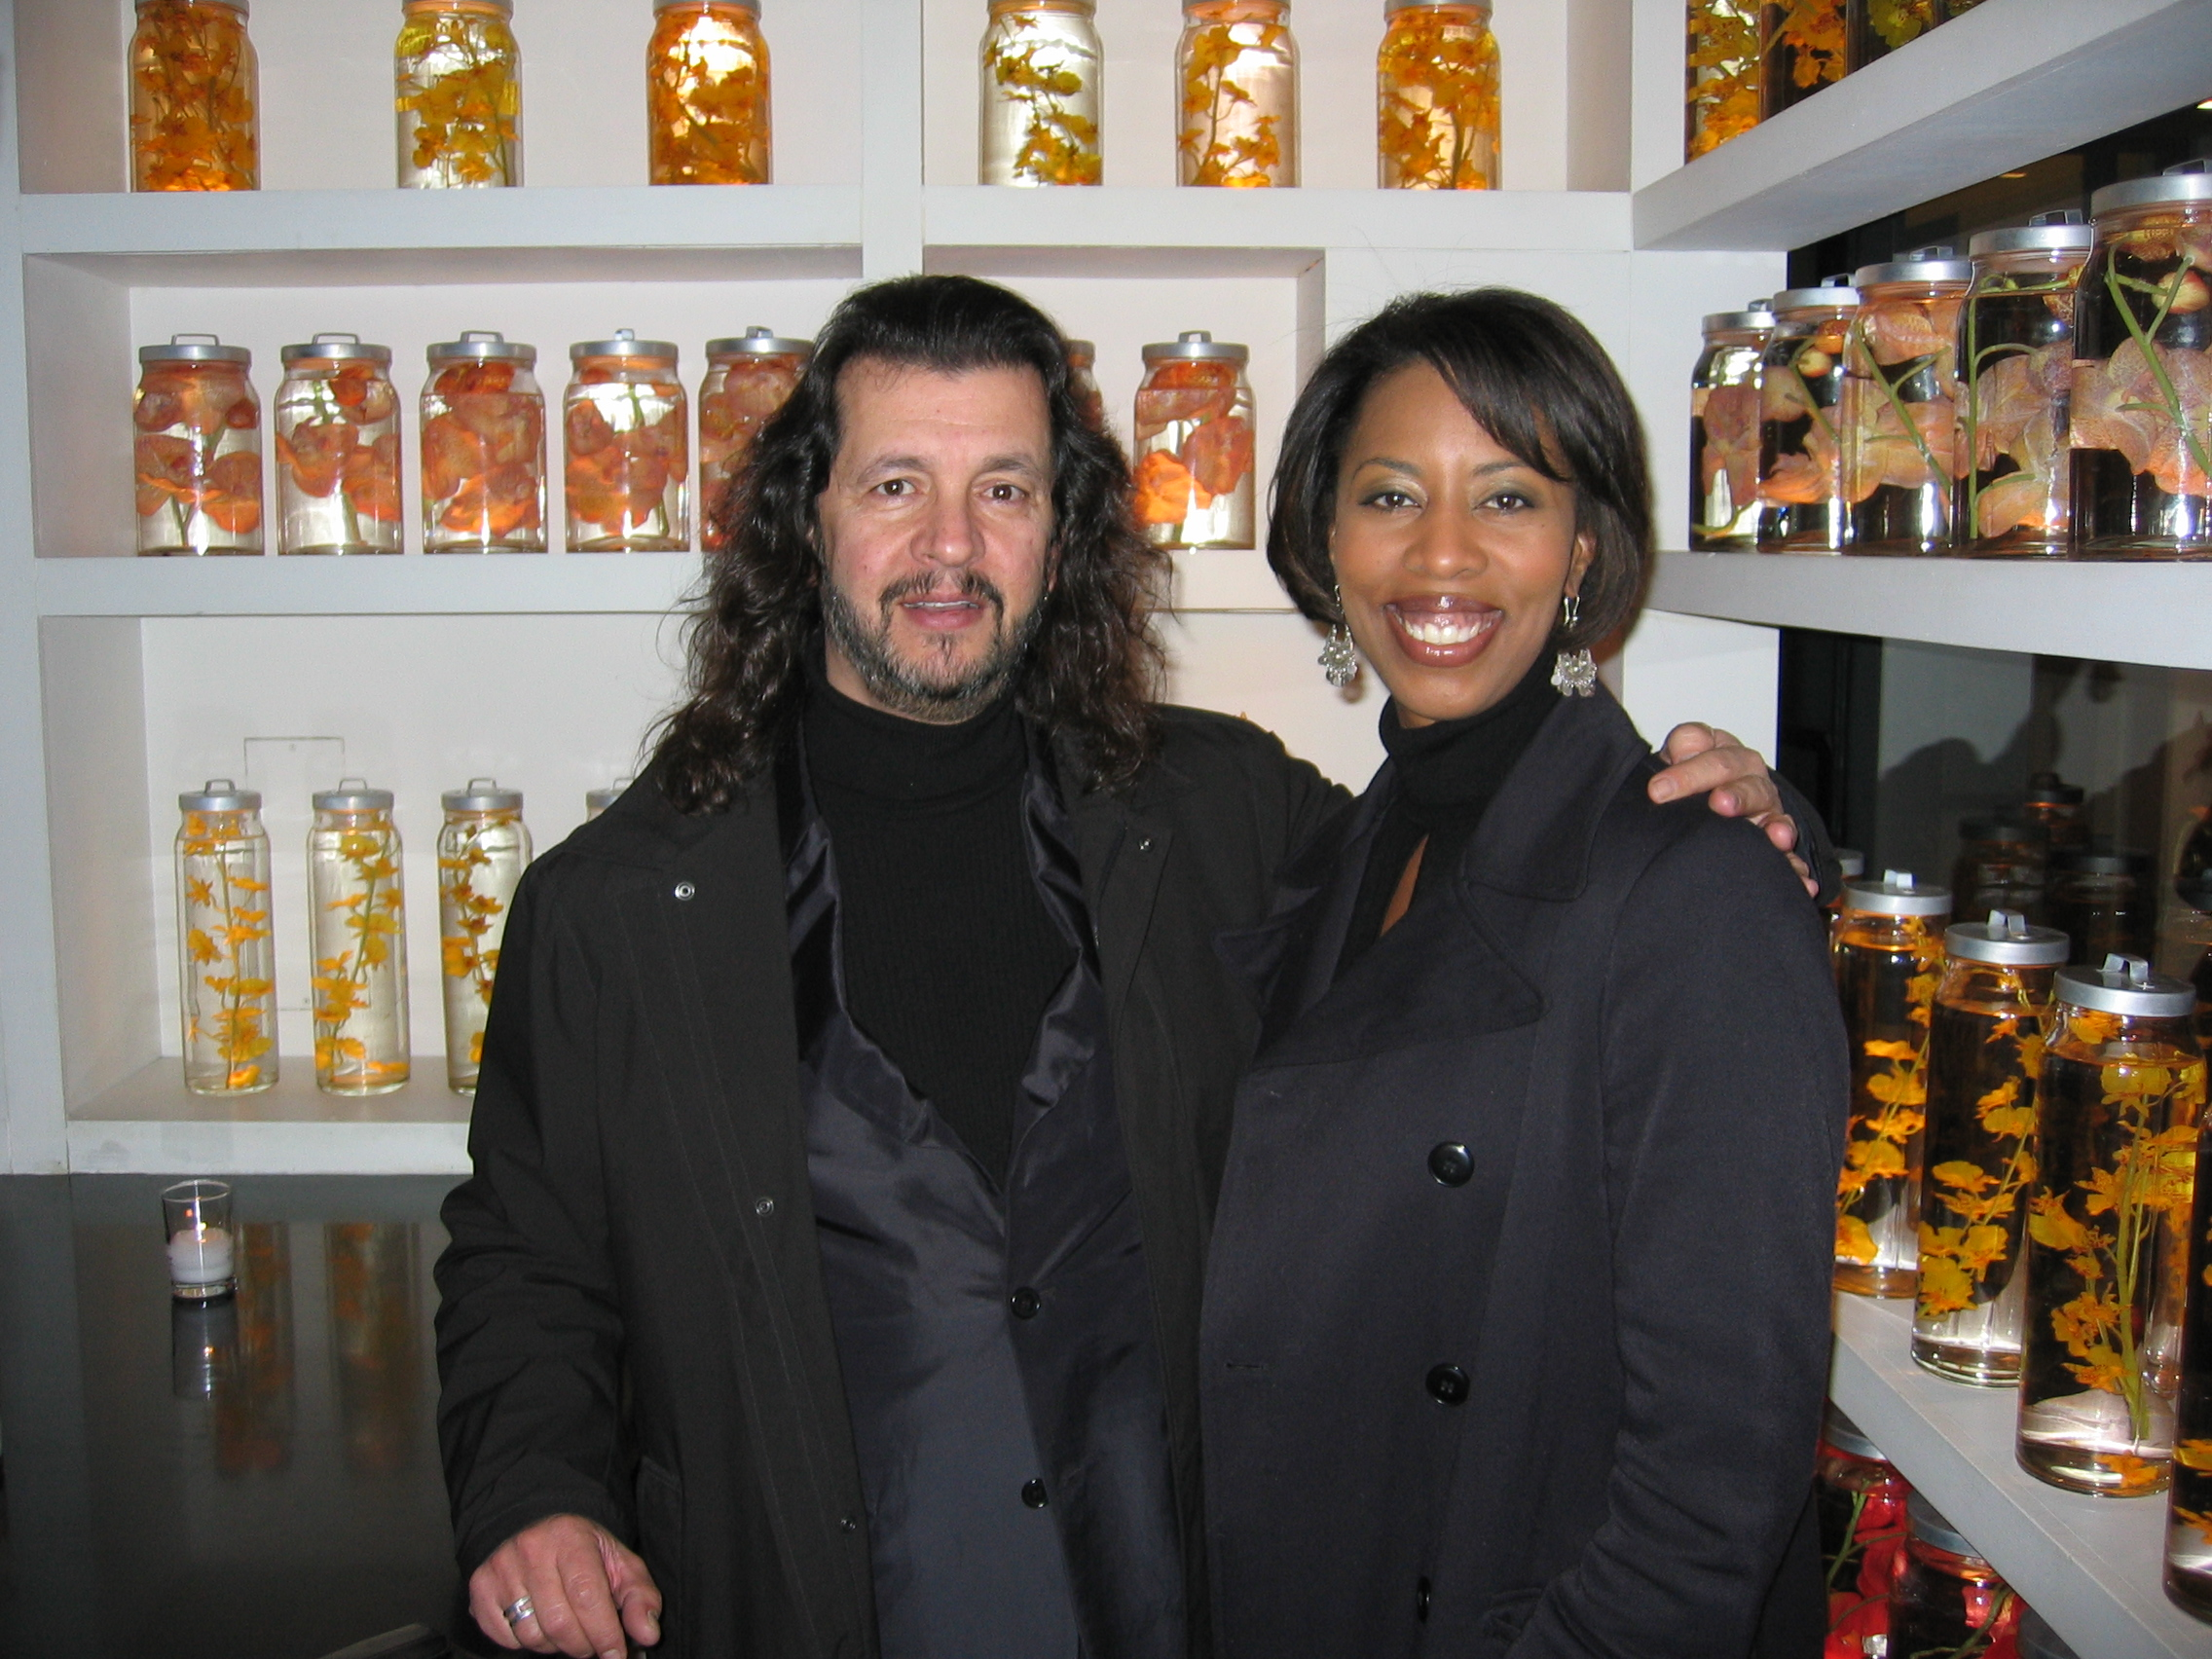 Interior Designers Cathy Hobbs and Andres Escobar